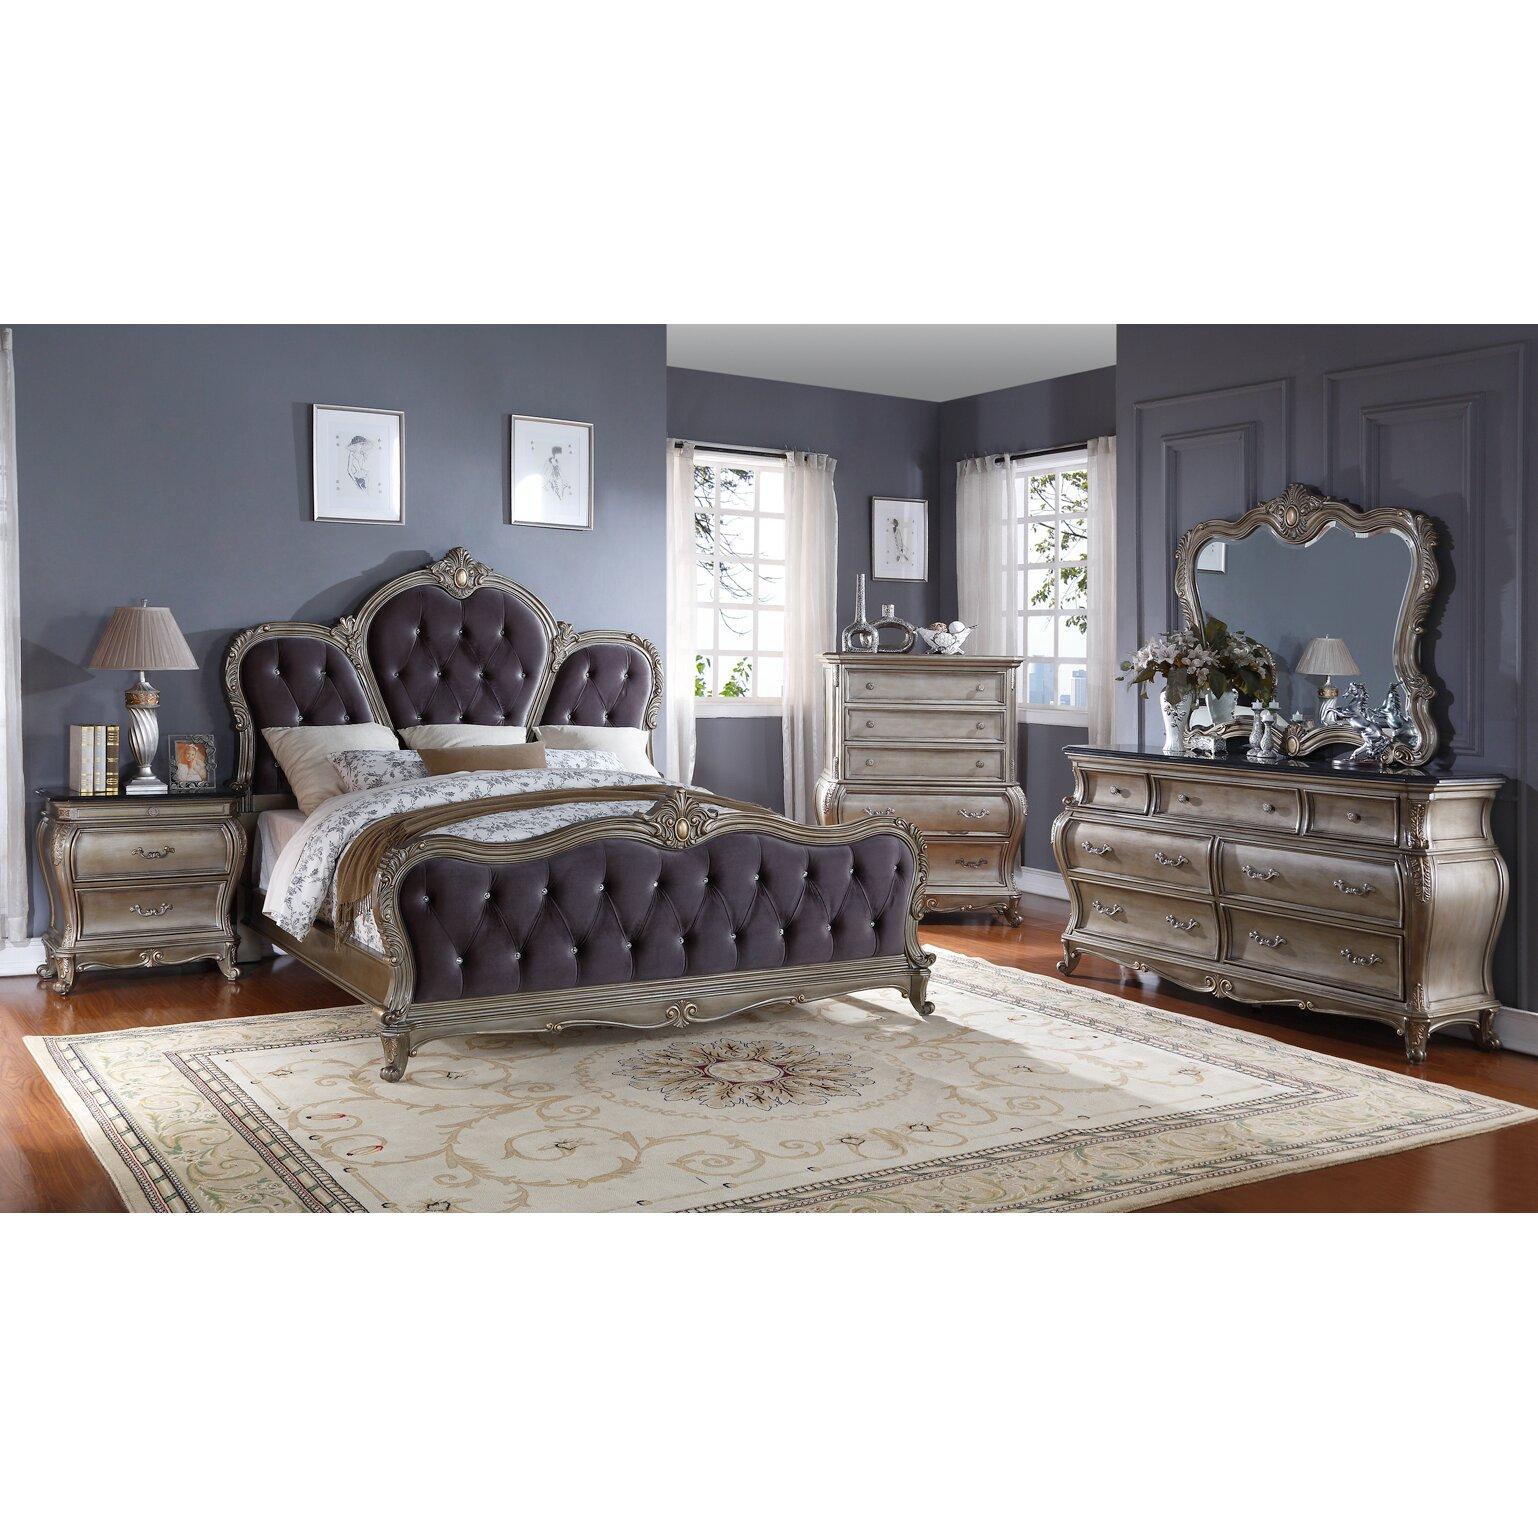 Meridian furniture usa roma 2 drawer nightstand reviews for Furniture usa